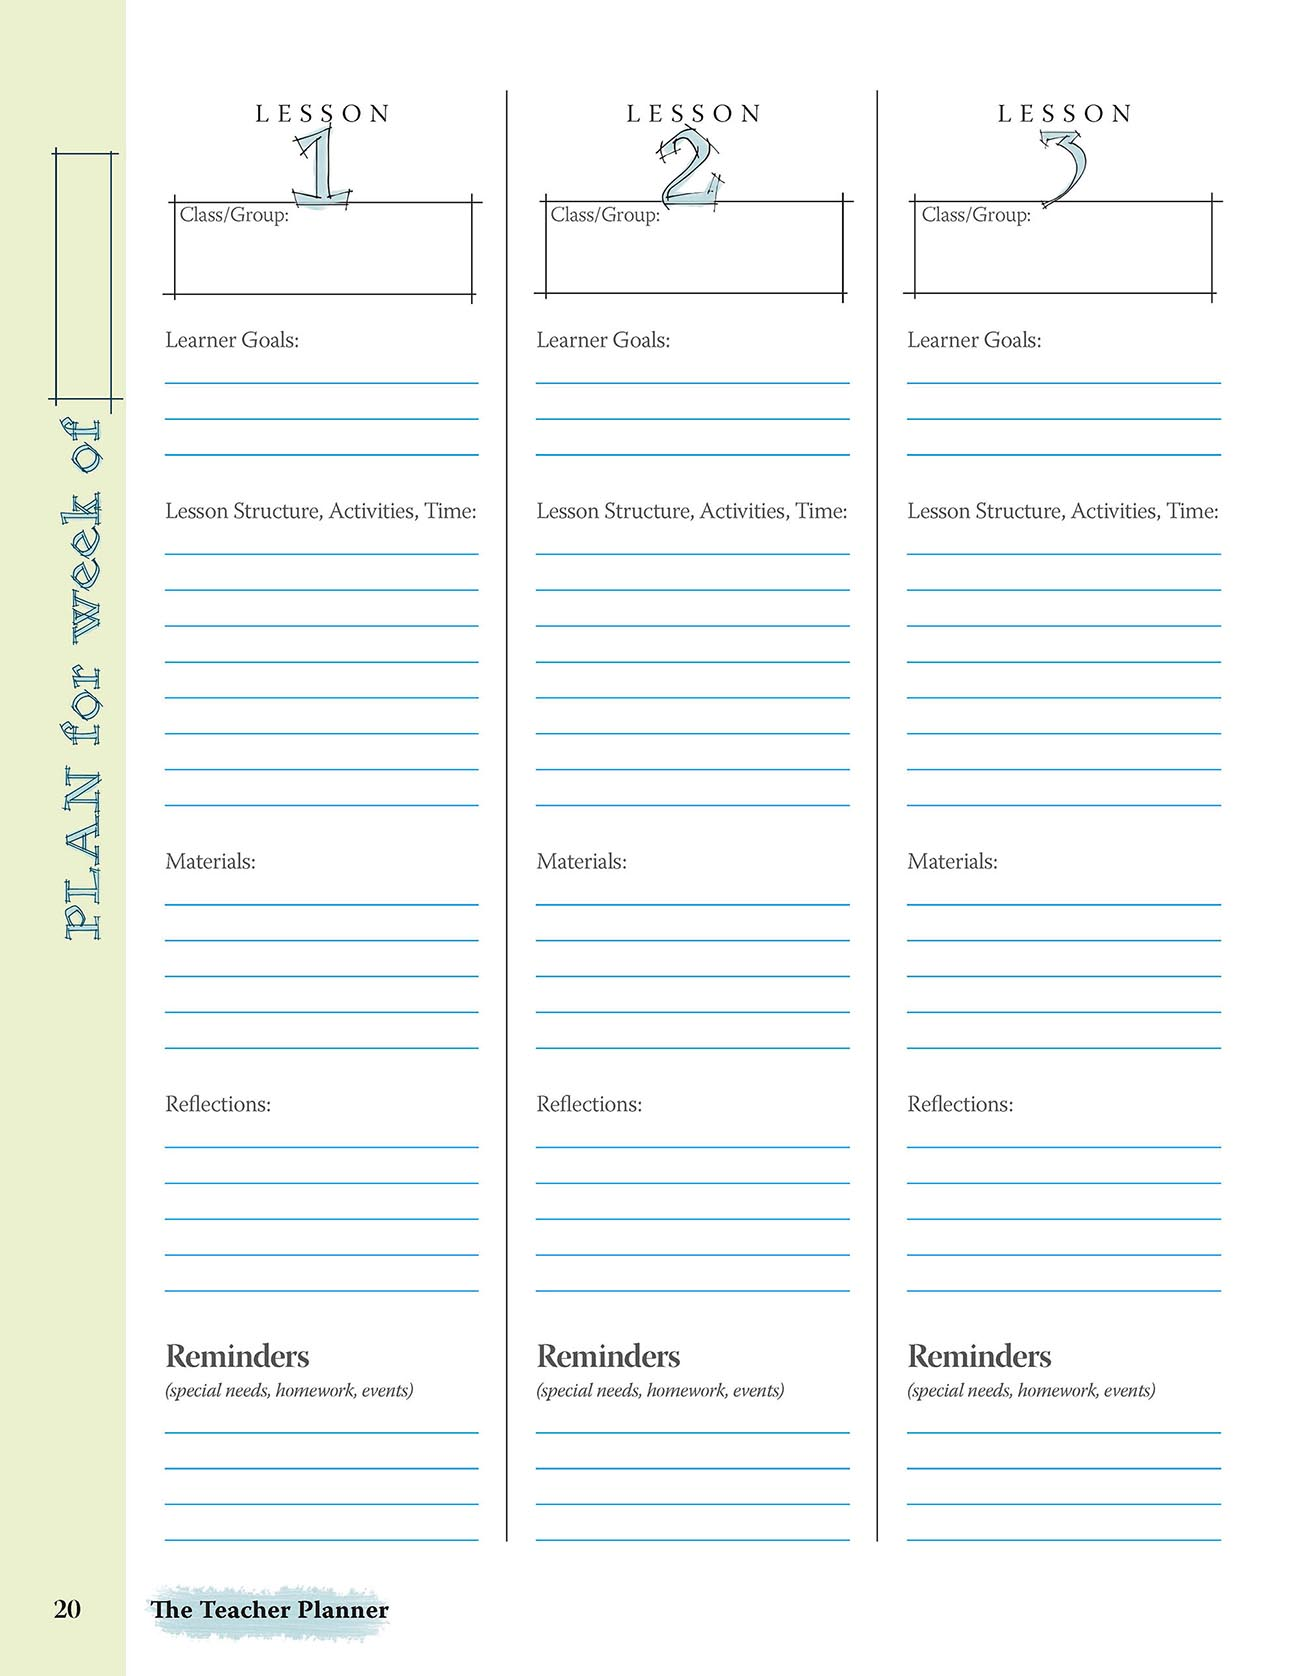 Teacher Planner Design